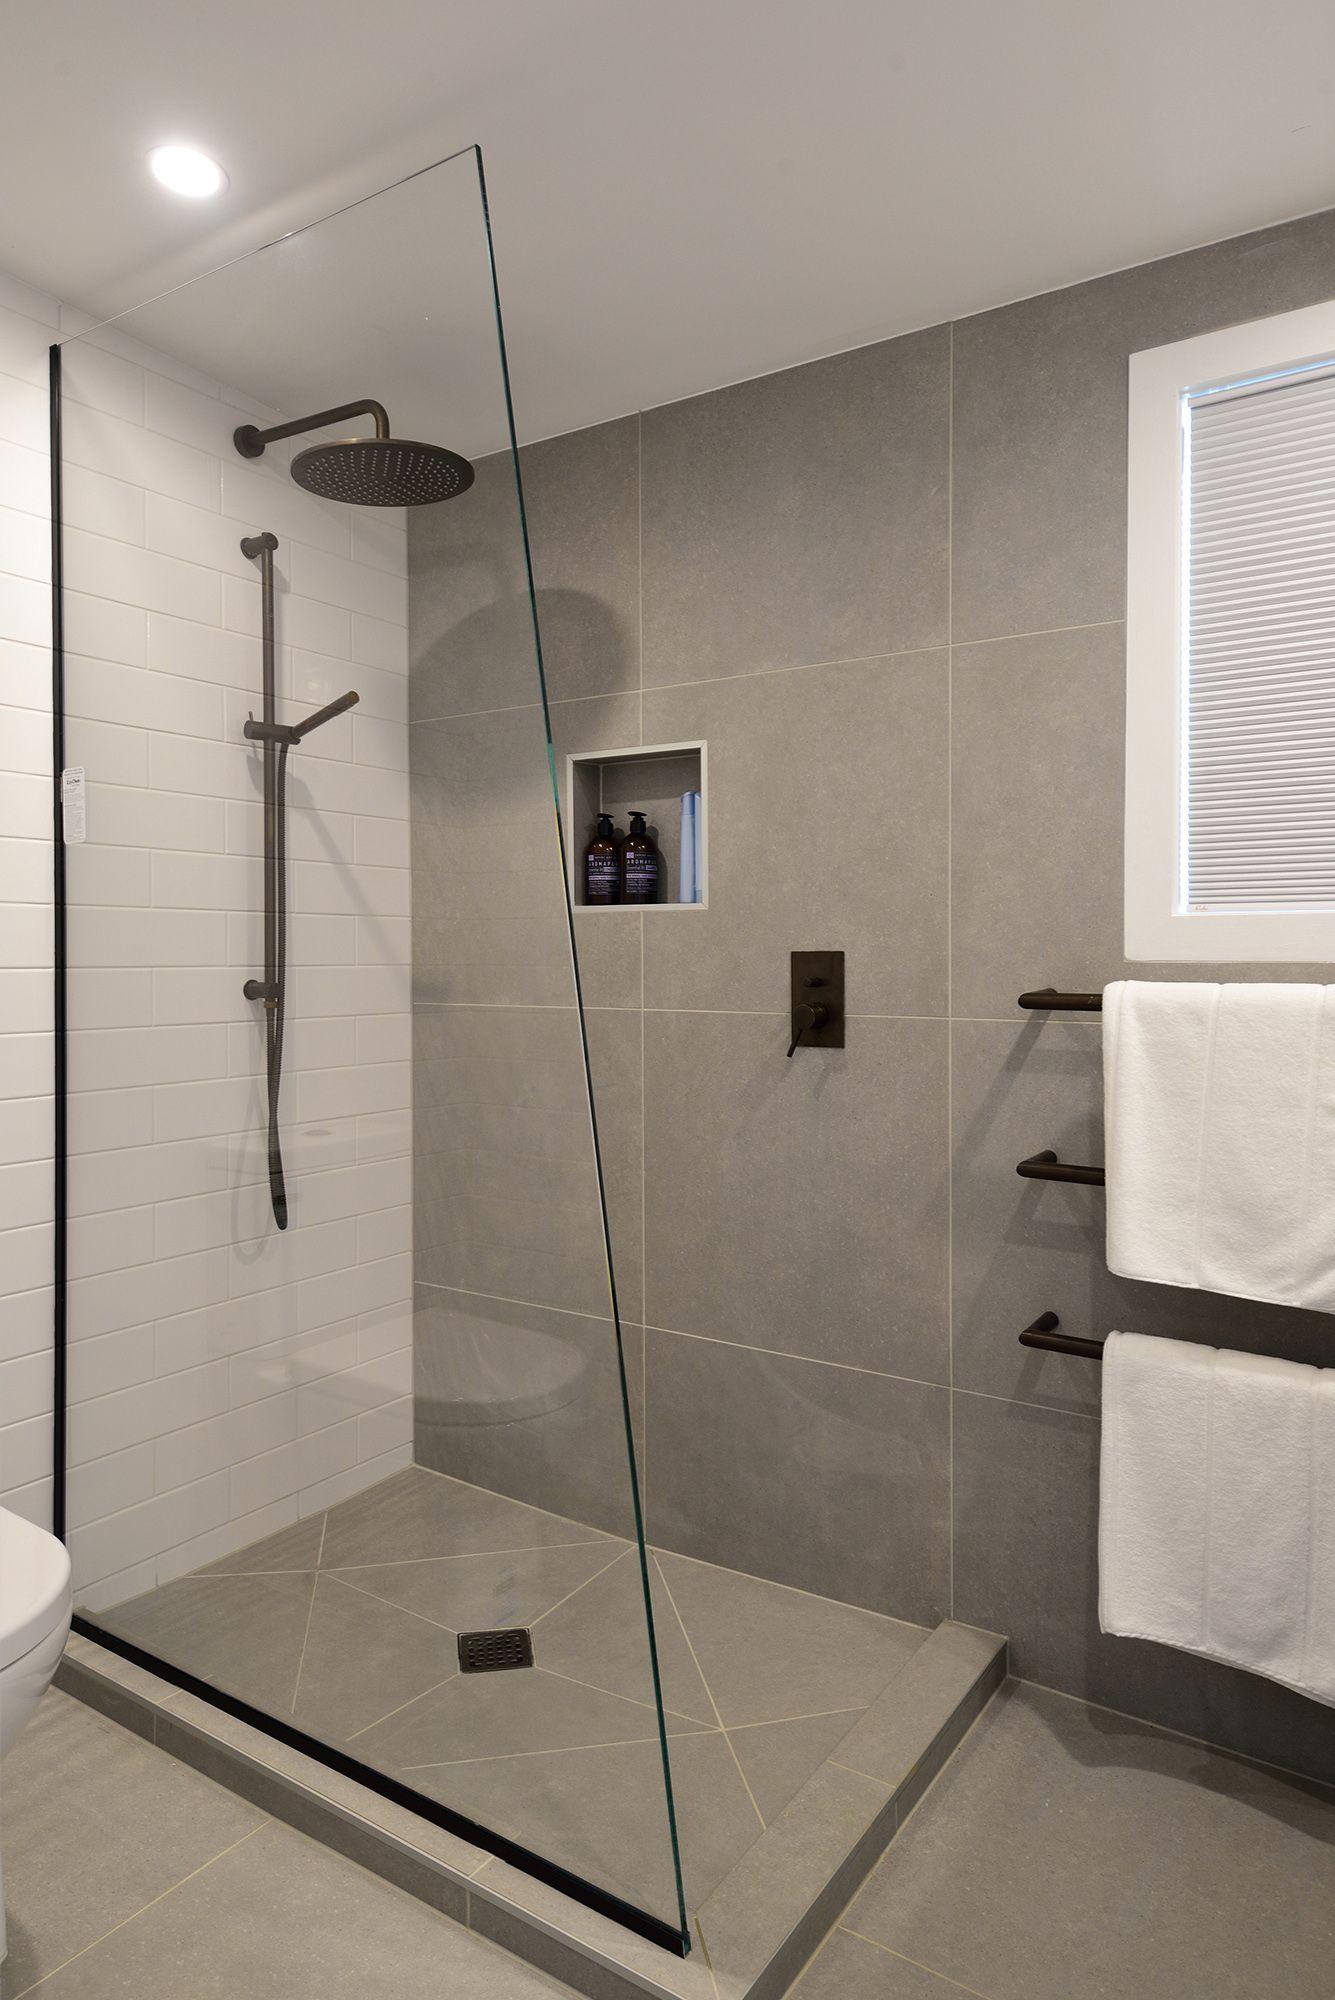 The Block Nz 2016 Bathroom And Kitchen Tiles In 2020 Bathroom Shower Walls Minimalist Small Bathrooms Bathroom Design Small